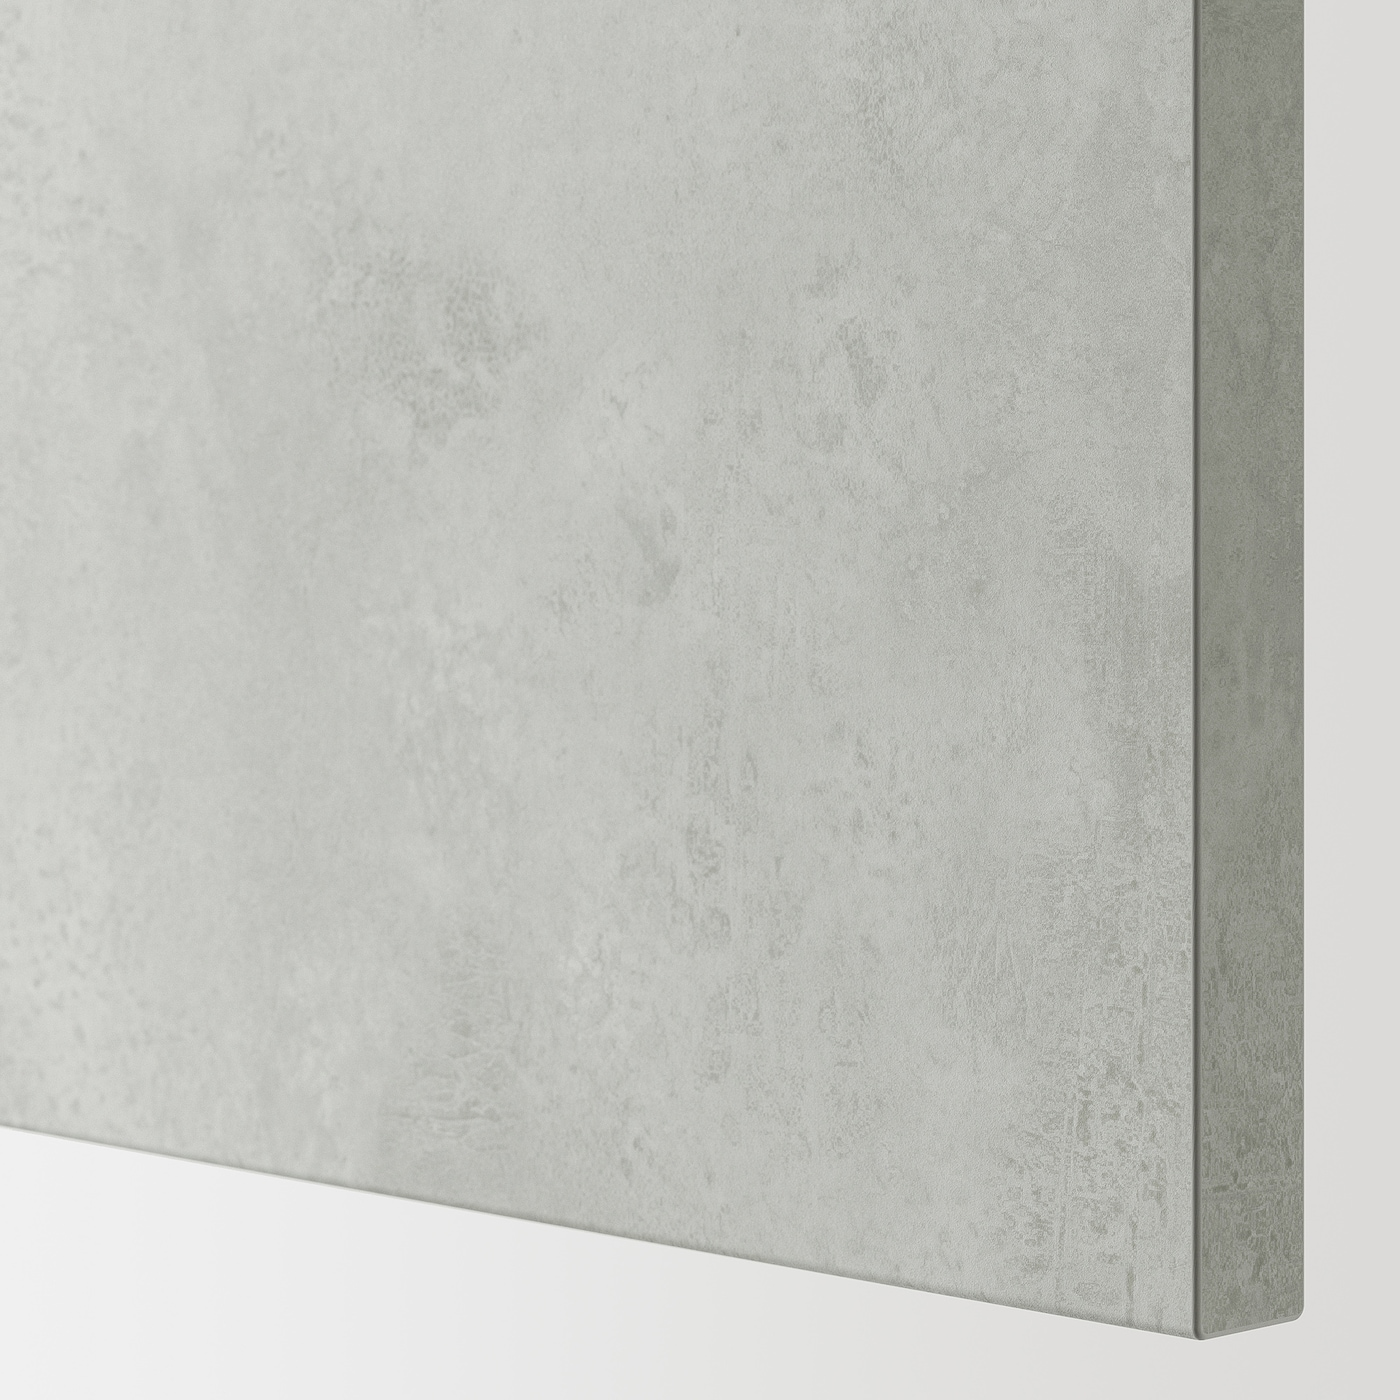 ENHET Zidni element s 2 police/vratima, bela/imitacija betona, 40x15x75 cm